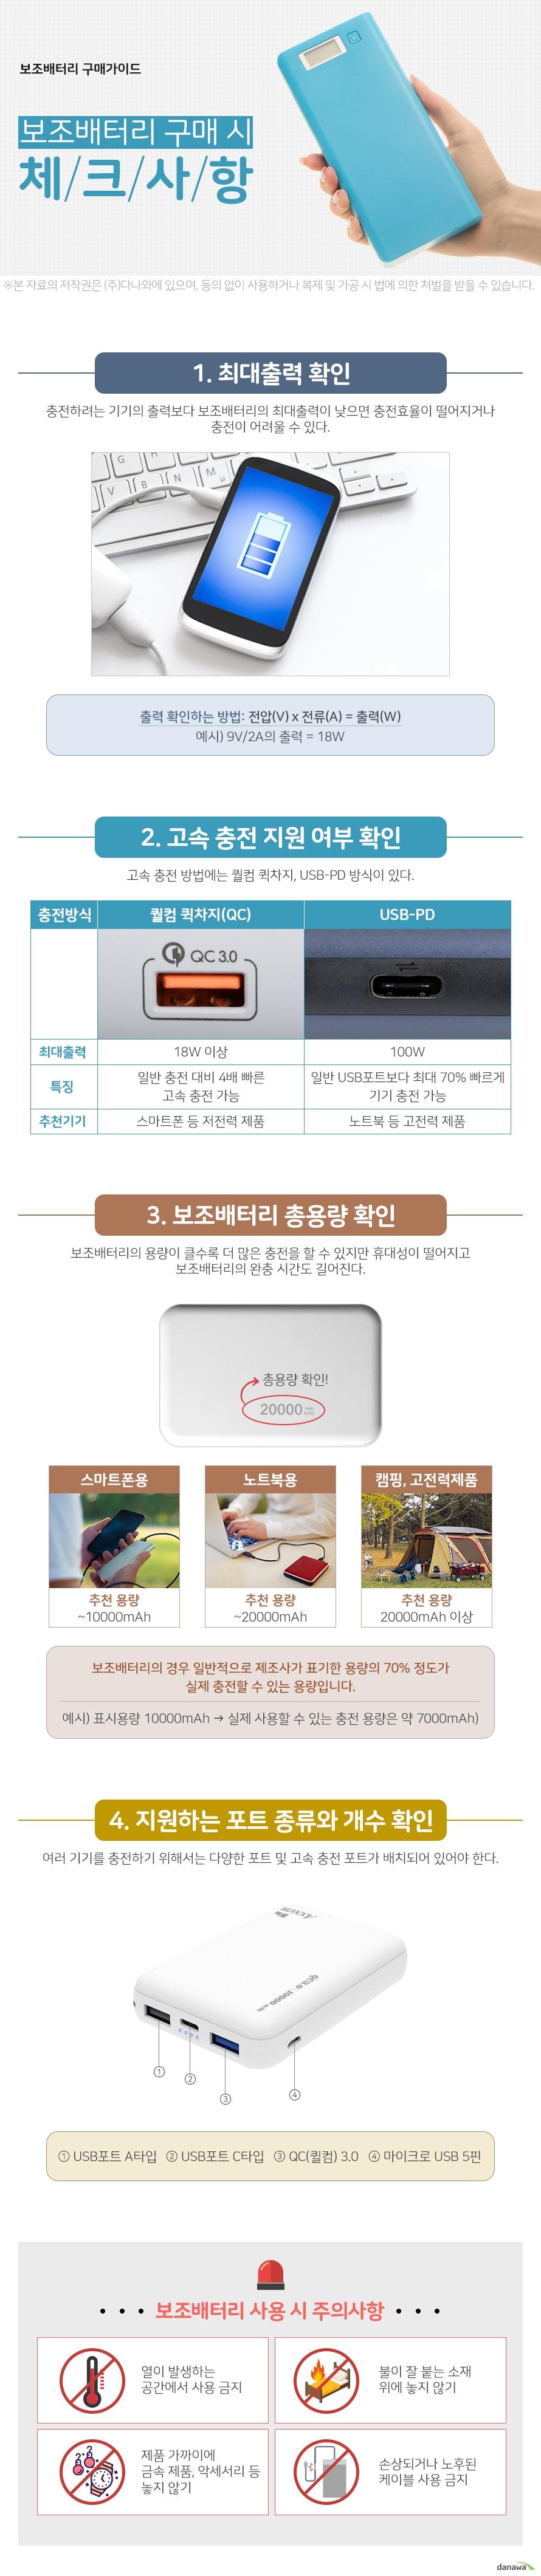 PLEOMAX 2포트 무선 보조배터리 PQW20 20000mAh (정품)